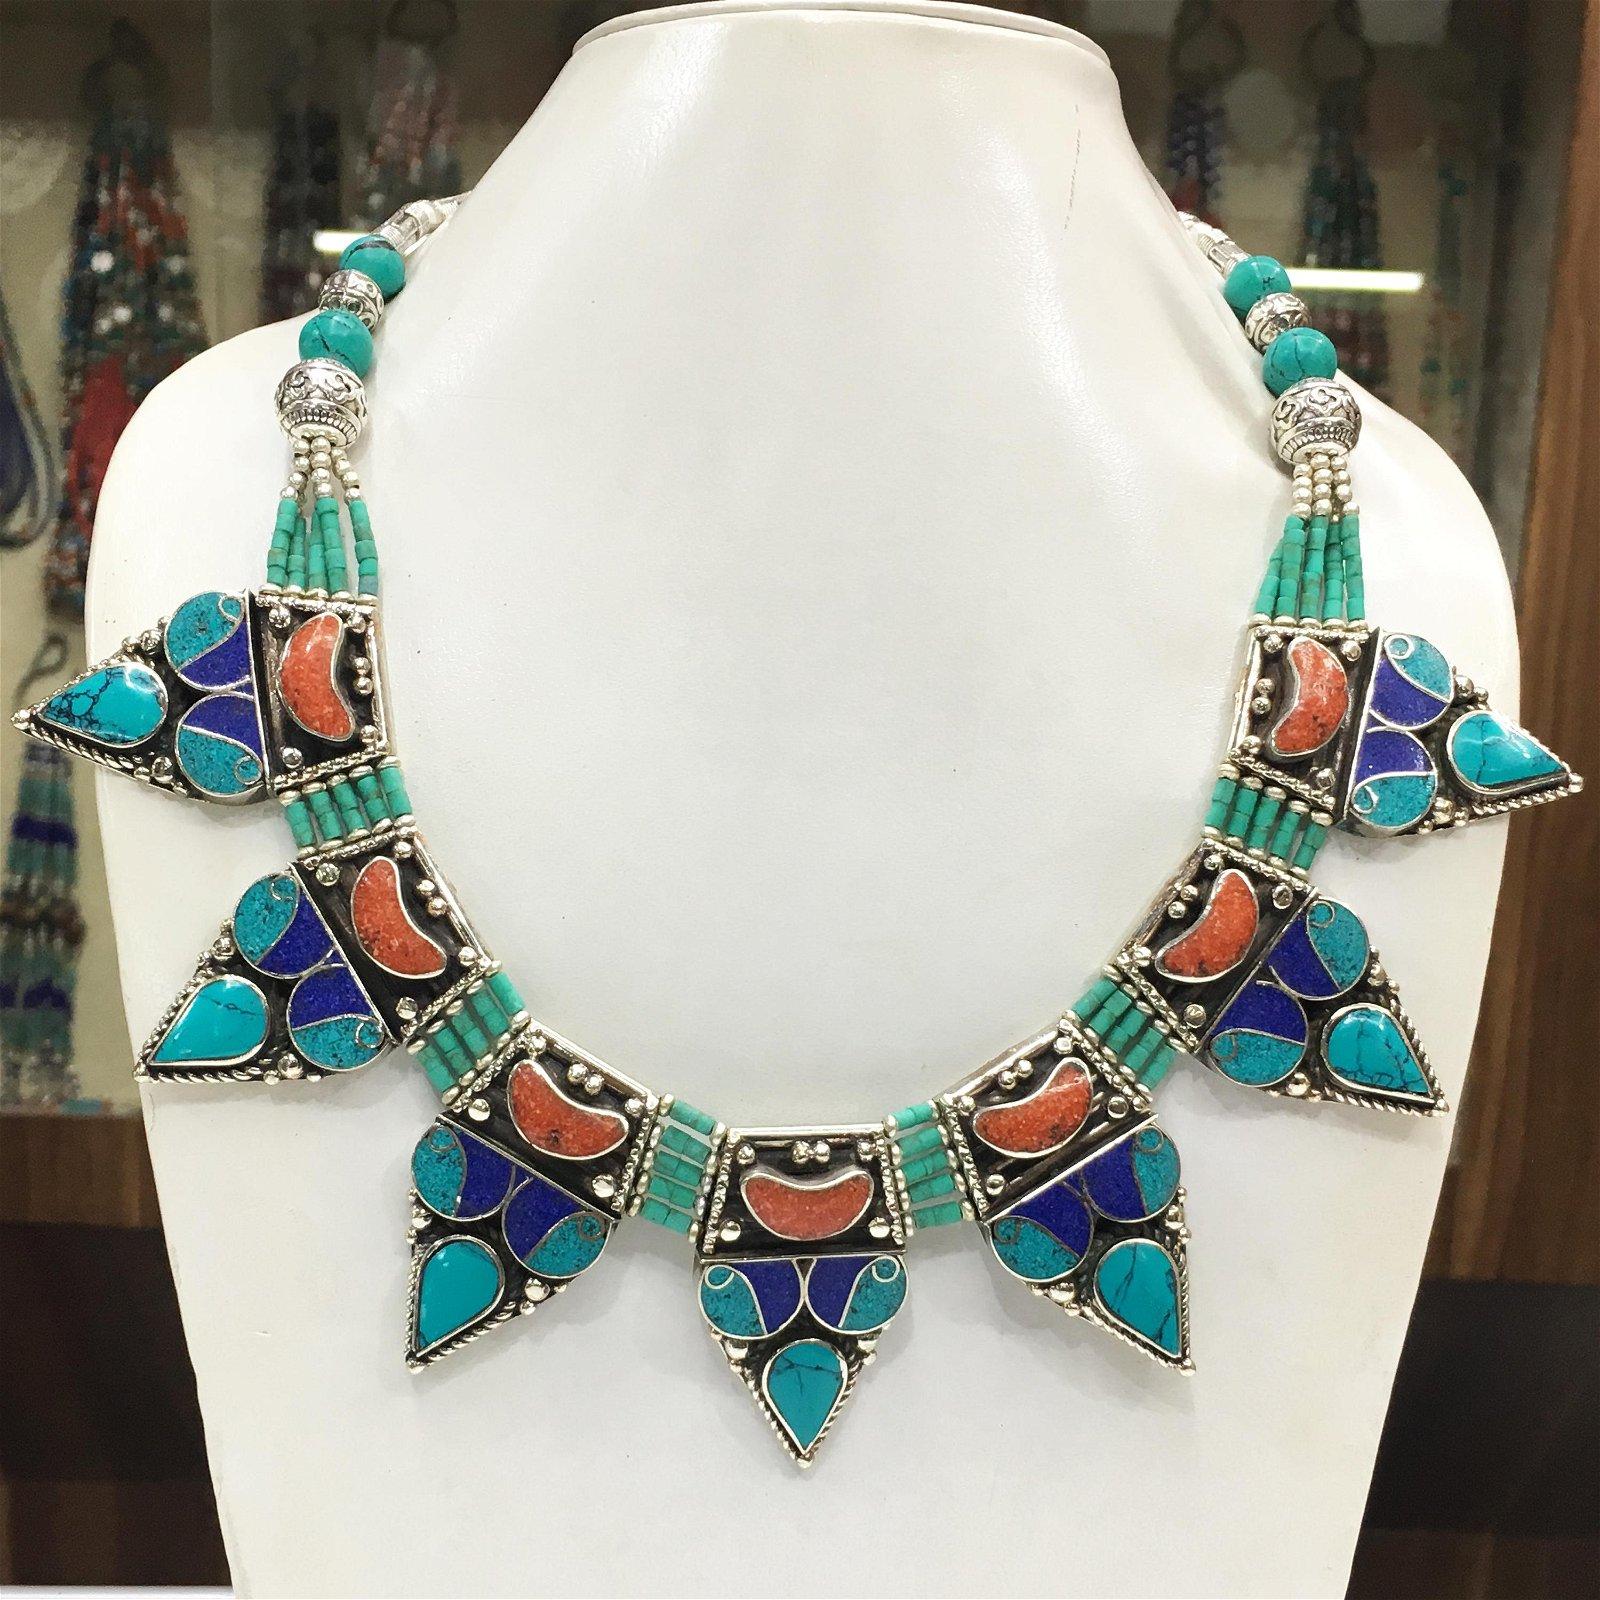 Tibetan Natural Turquoise & Coral Chokar Necklace